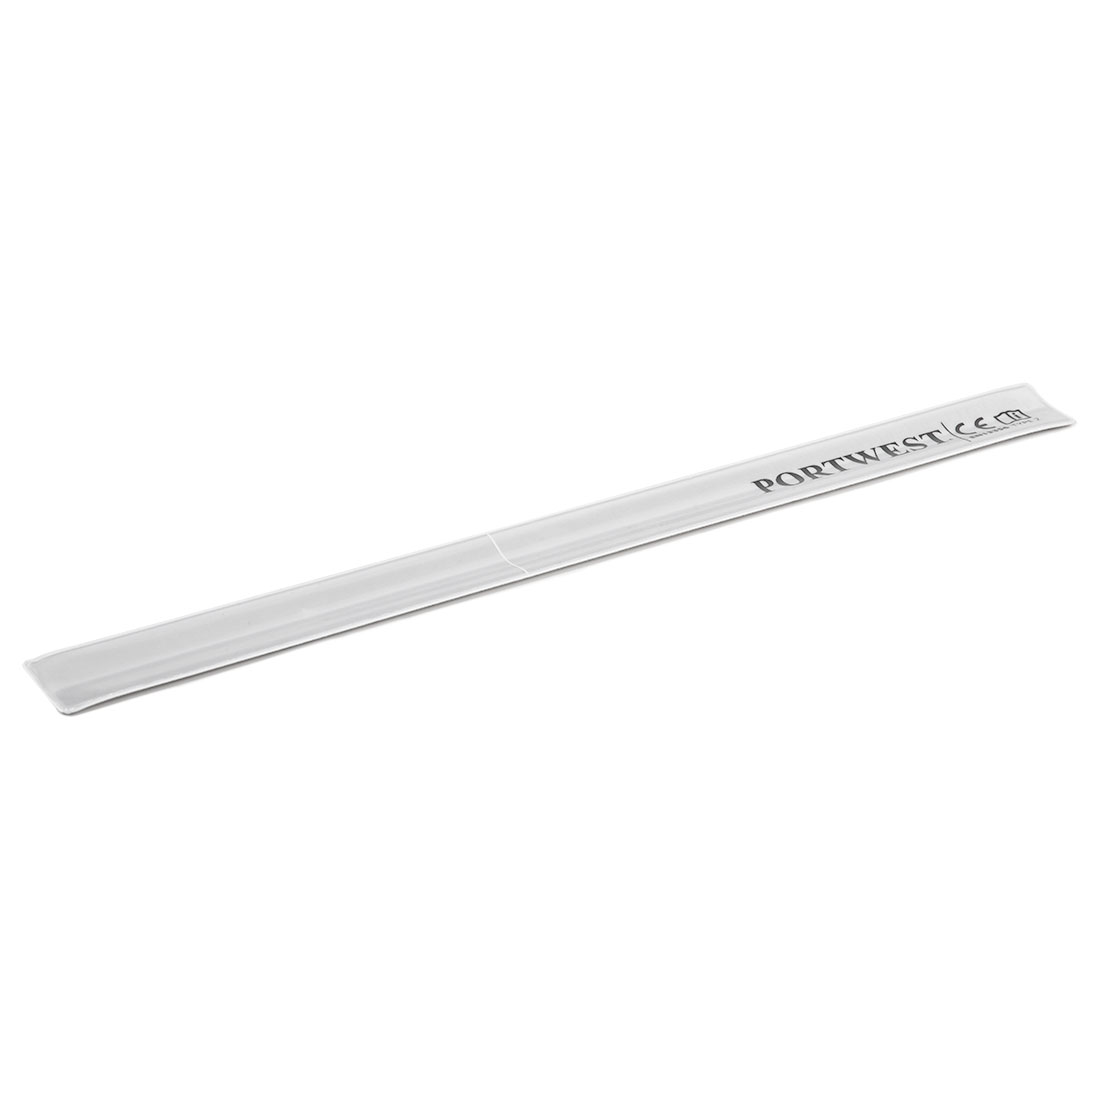 Portwest Reflective Slap Wrap Band 38 x 3cm - HV03